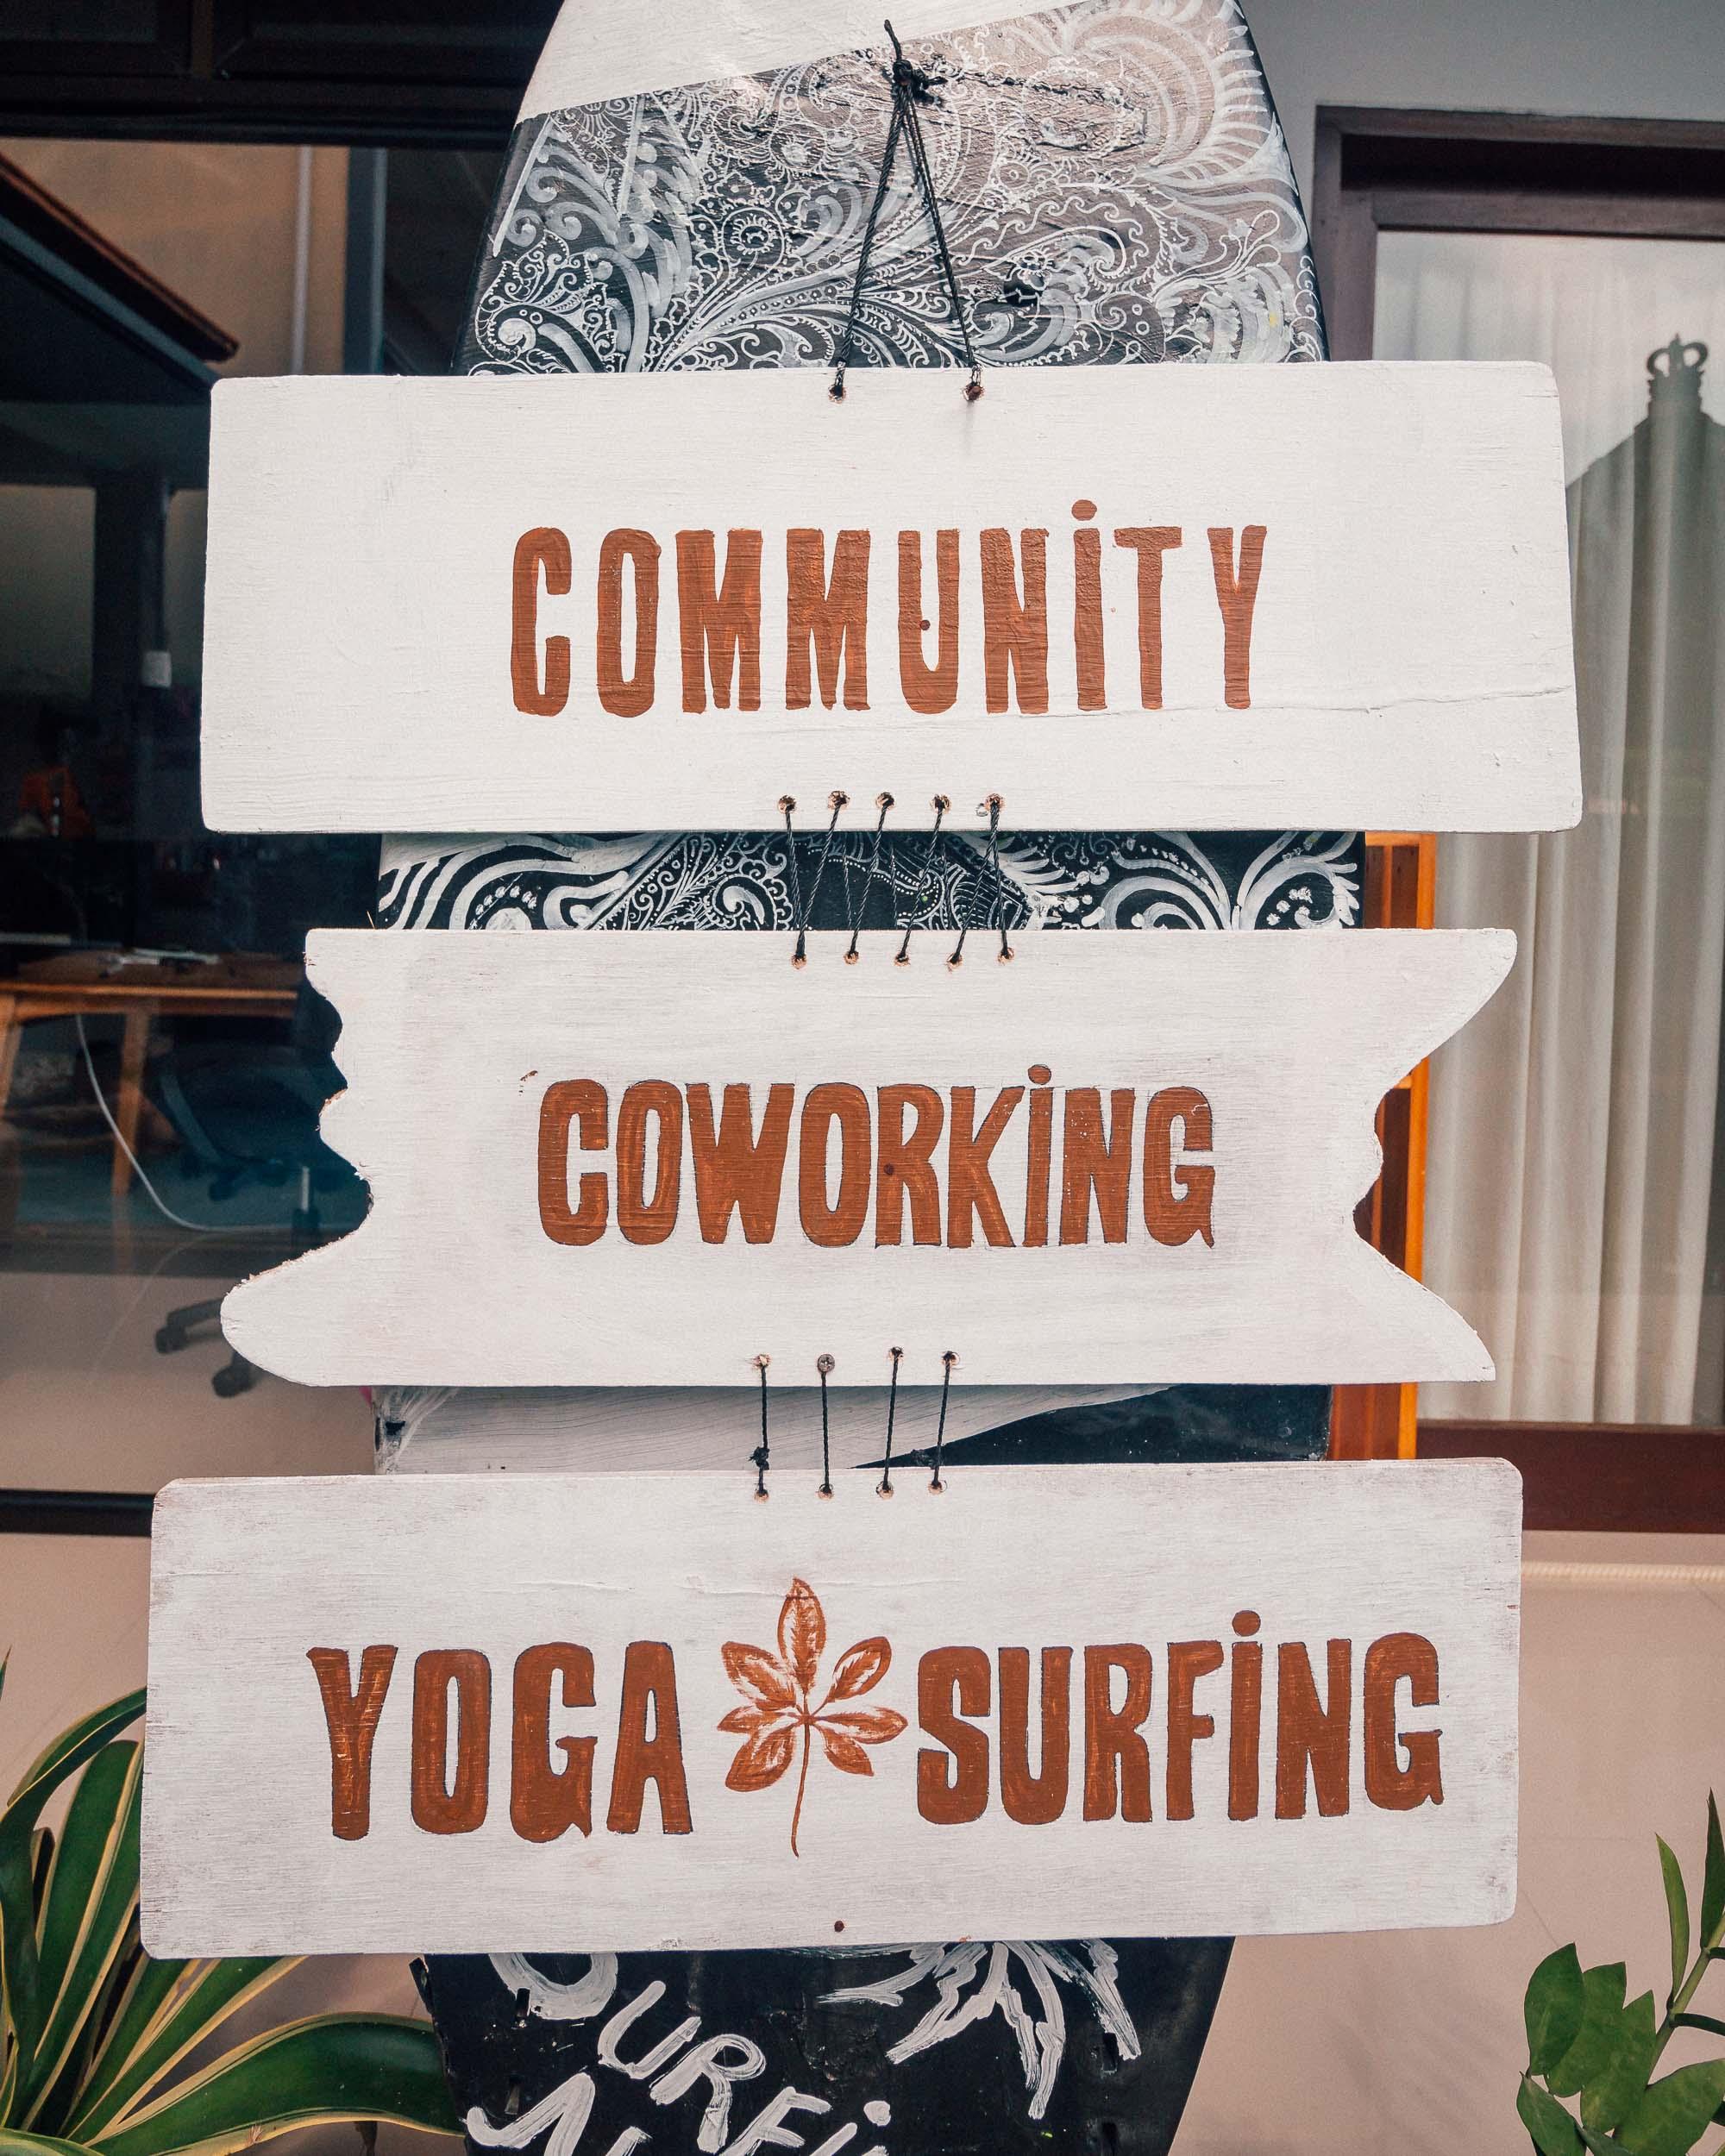 The best coworking space in Bali surfing nomads digital remote work community yoga lifestyle canggu beach batu bolong